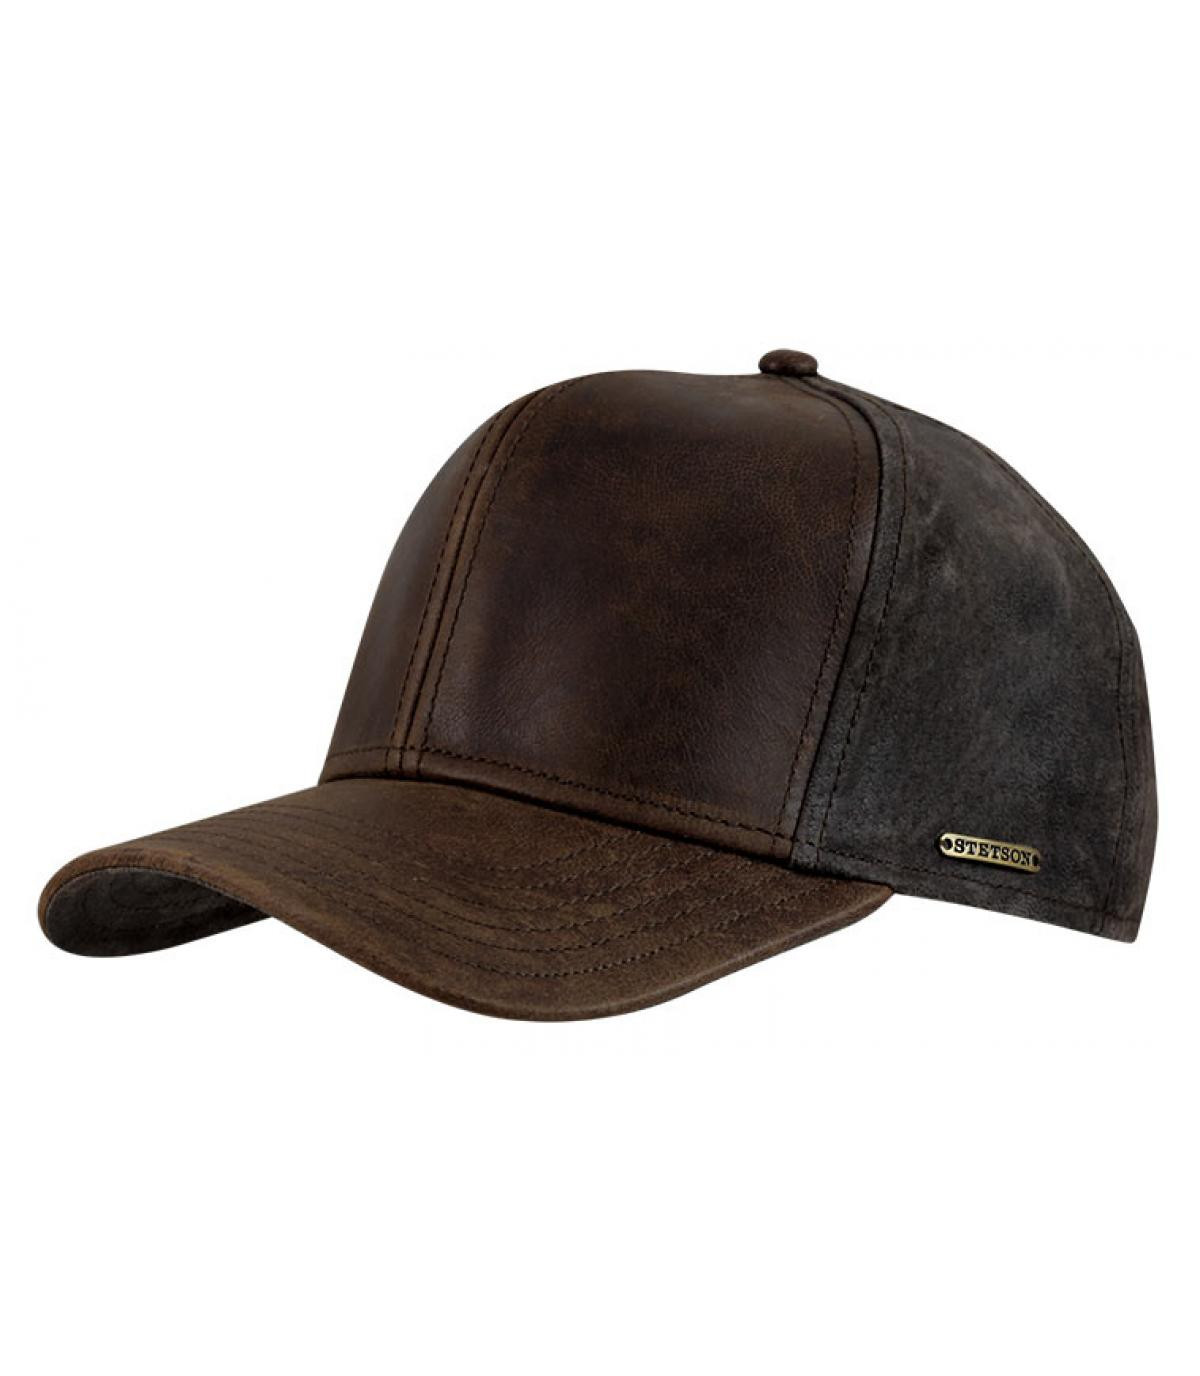 Gorra campbell cuir